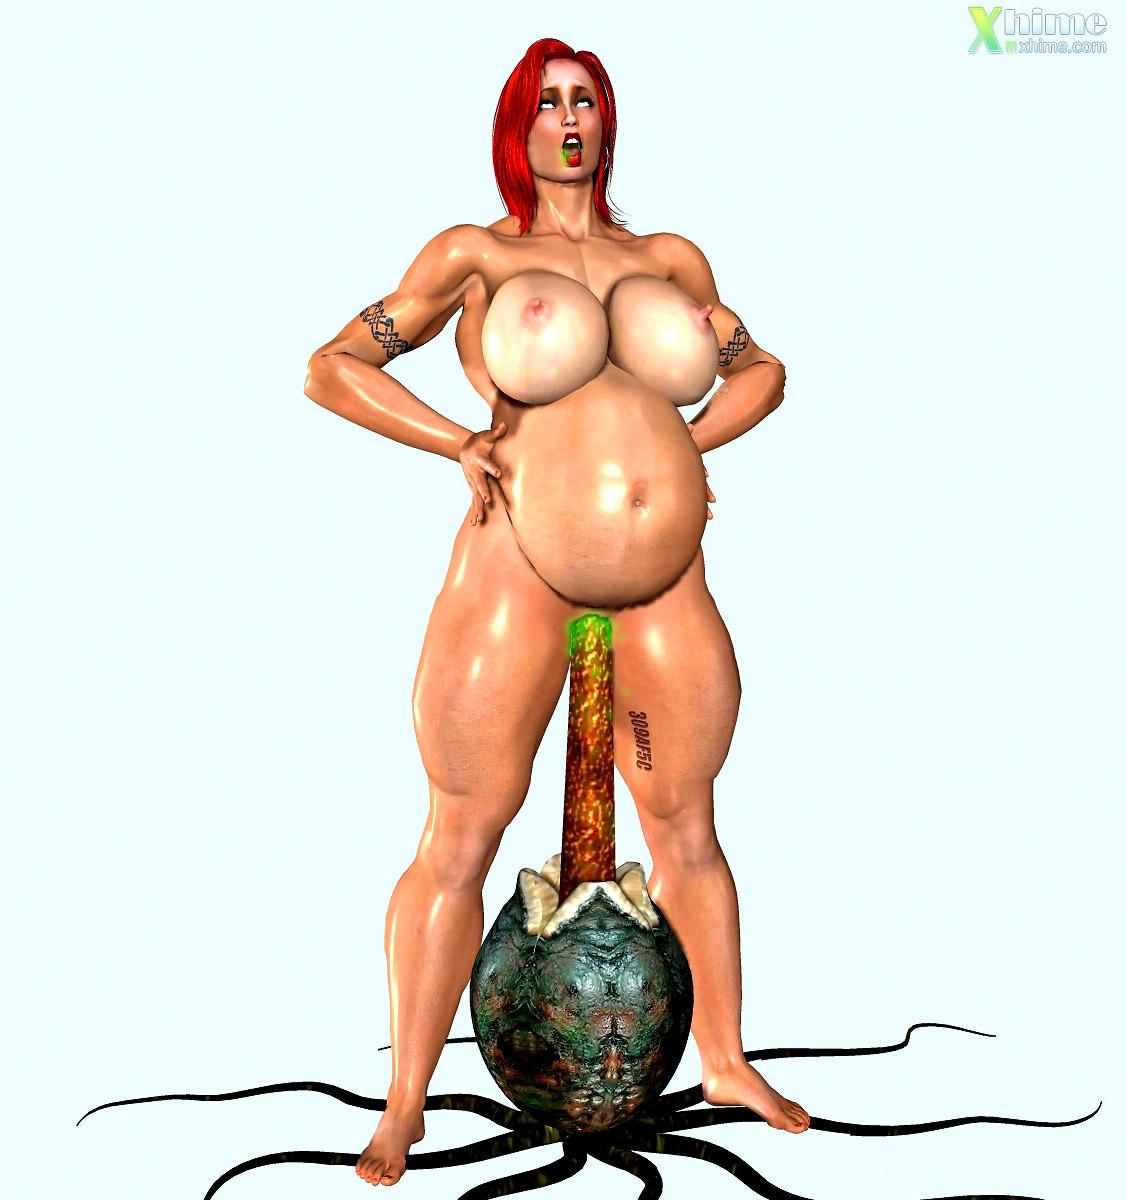 Sex Alien Impregnate Hentai - Hentai Alien Tentacle image #214717